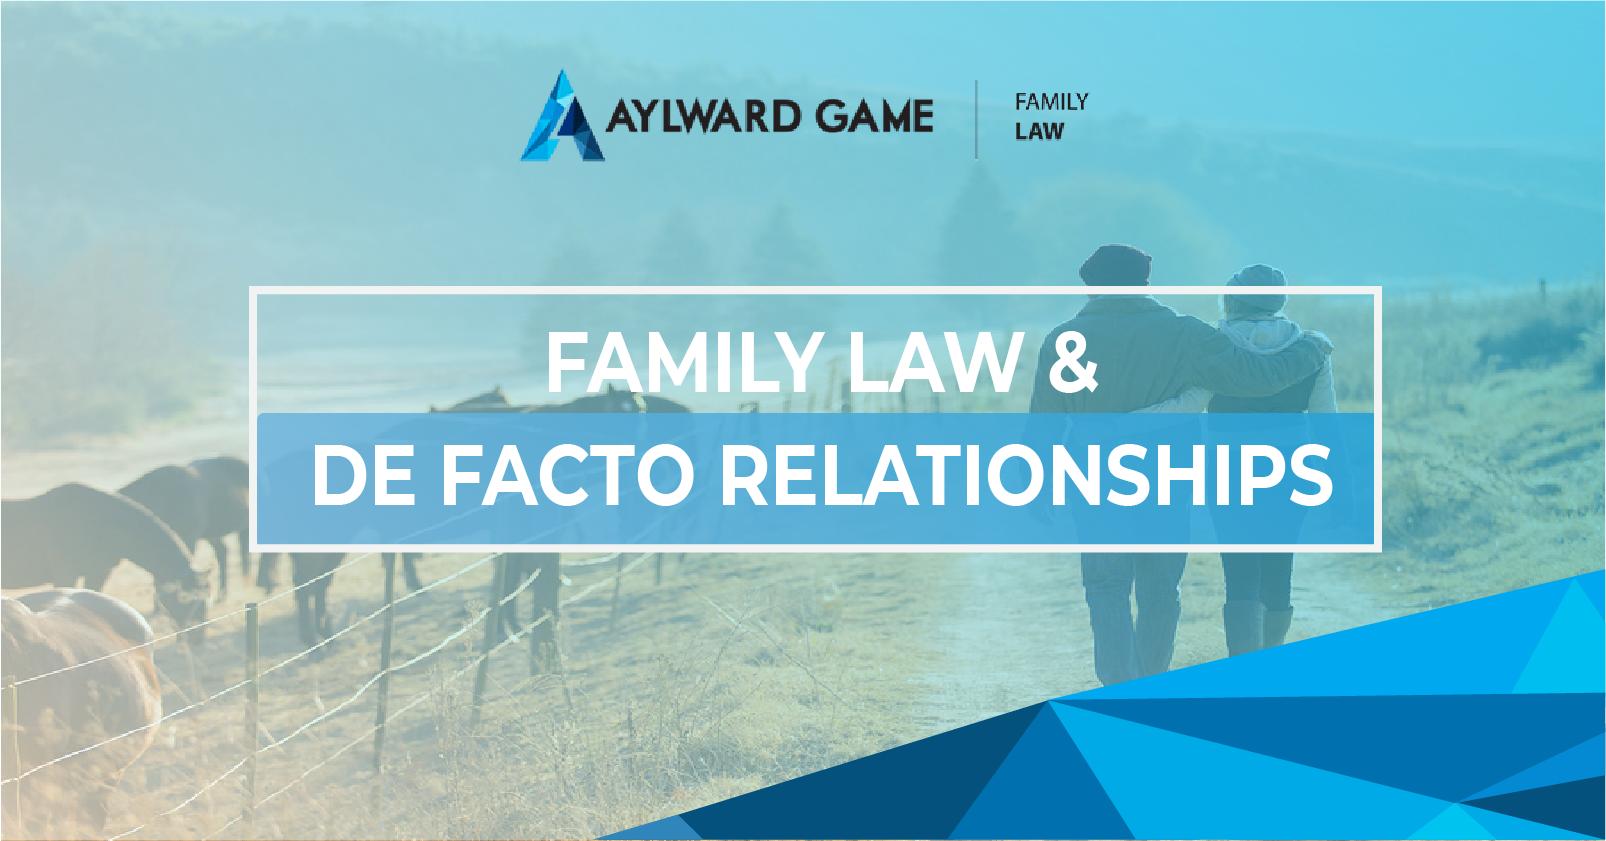 FAMILY LAW & DE FACTO RELATIONSHIPS